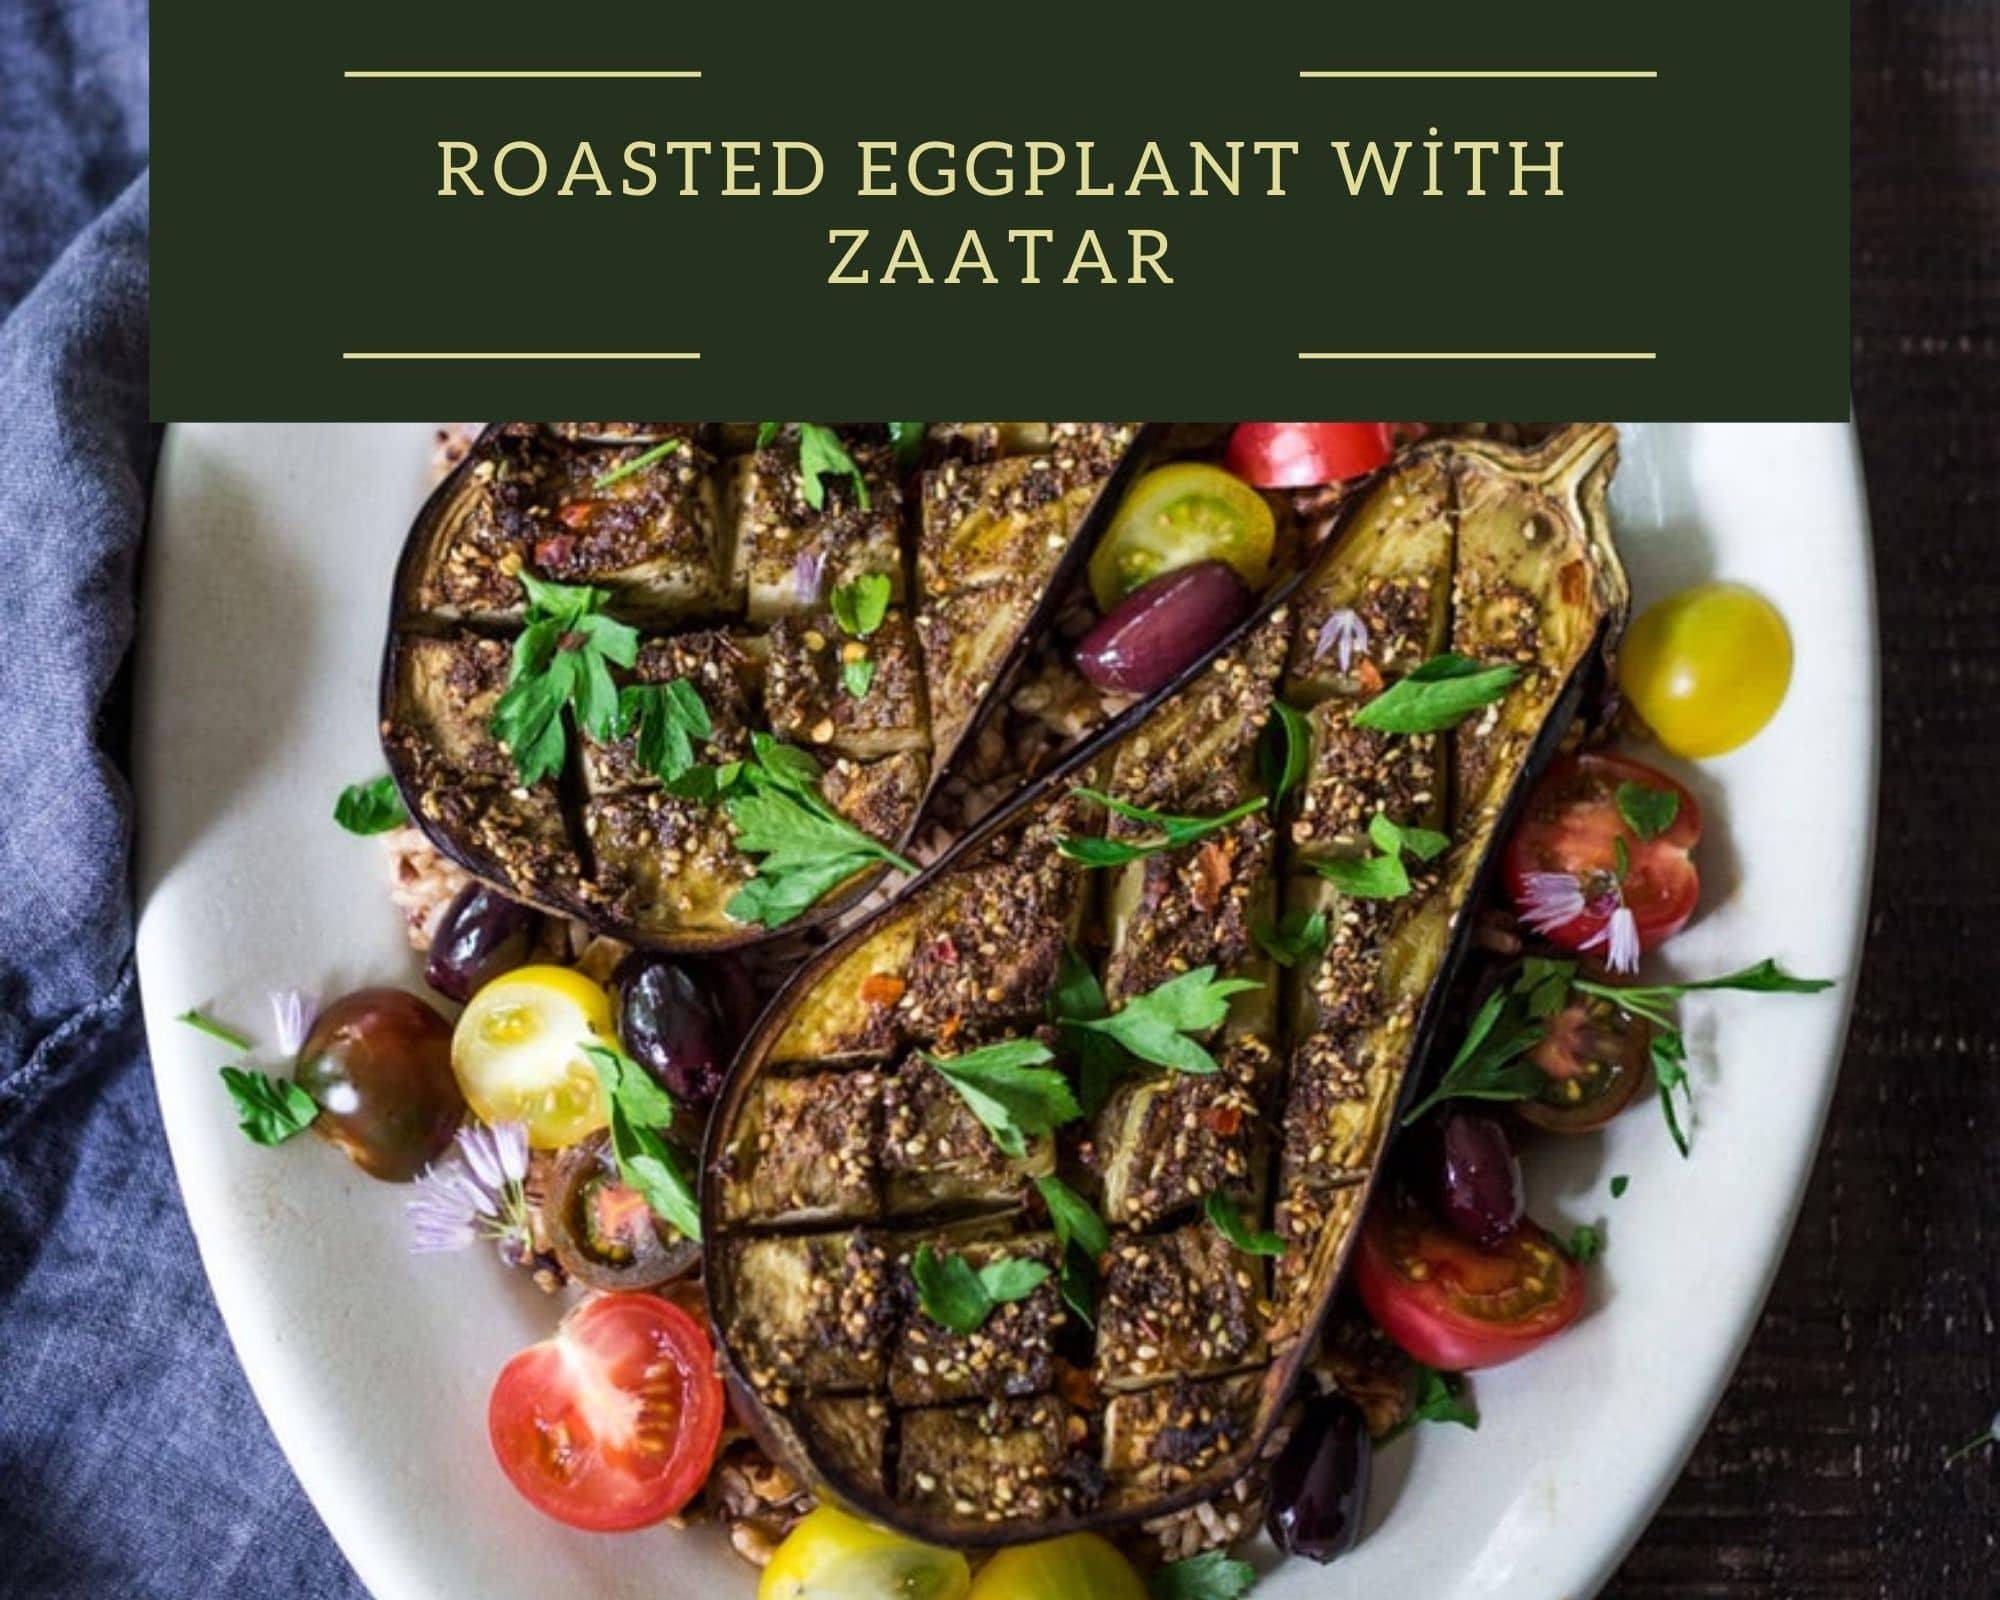 roasted eggplant with zaatar